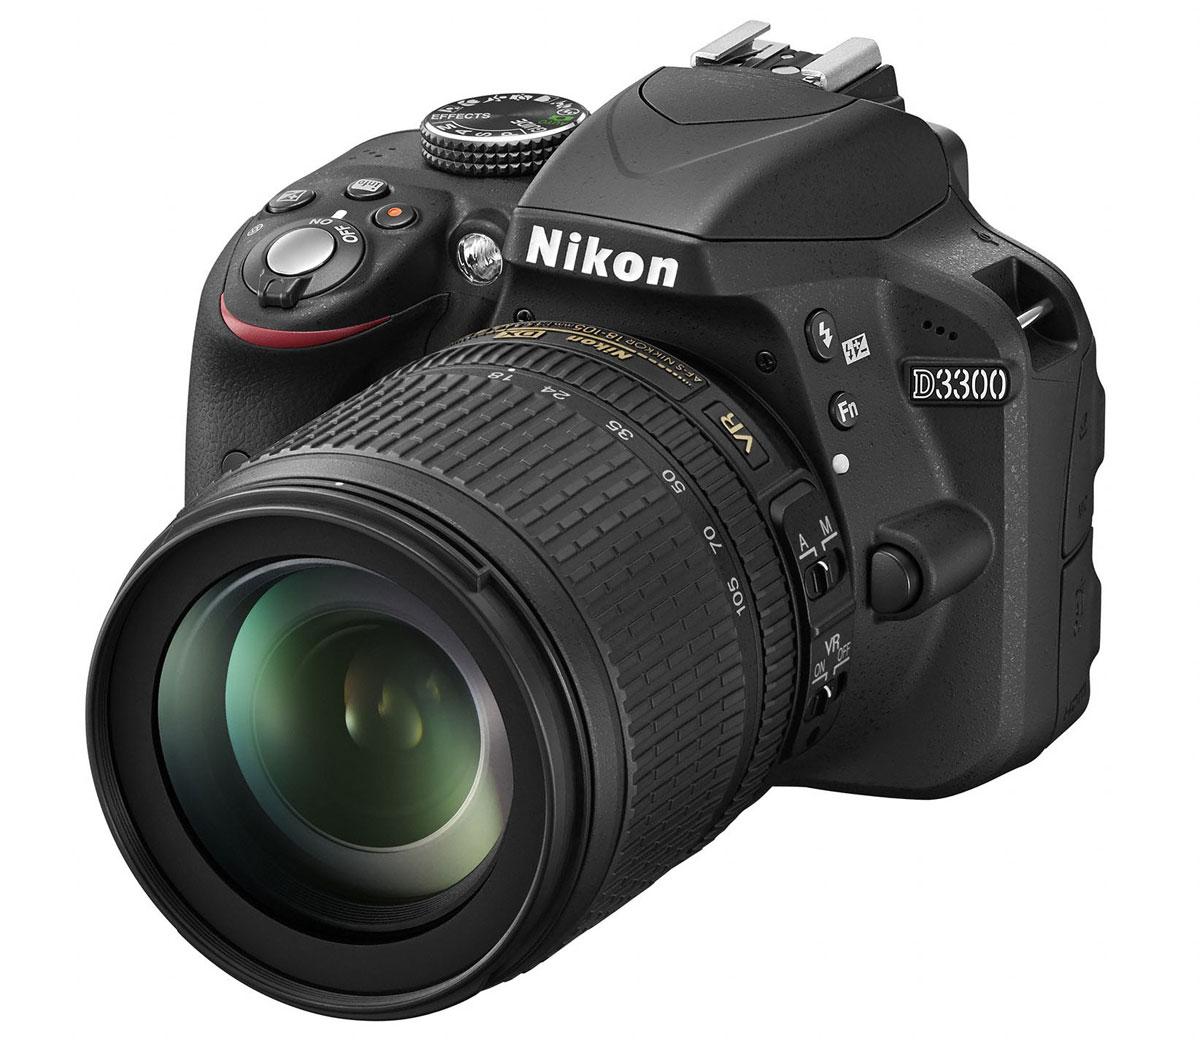 Nikon D3300 Kit 18-105 VR, Black цифровая зеркальная фотокамераVBA390K005